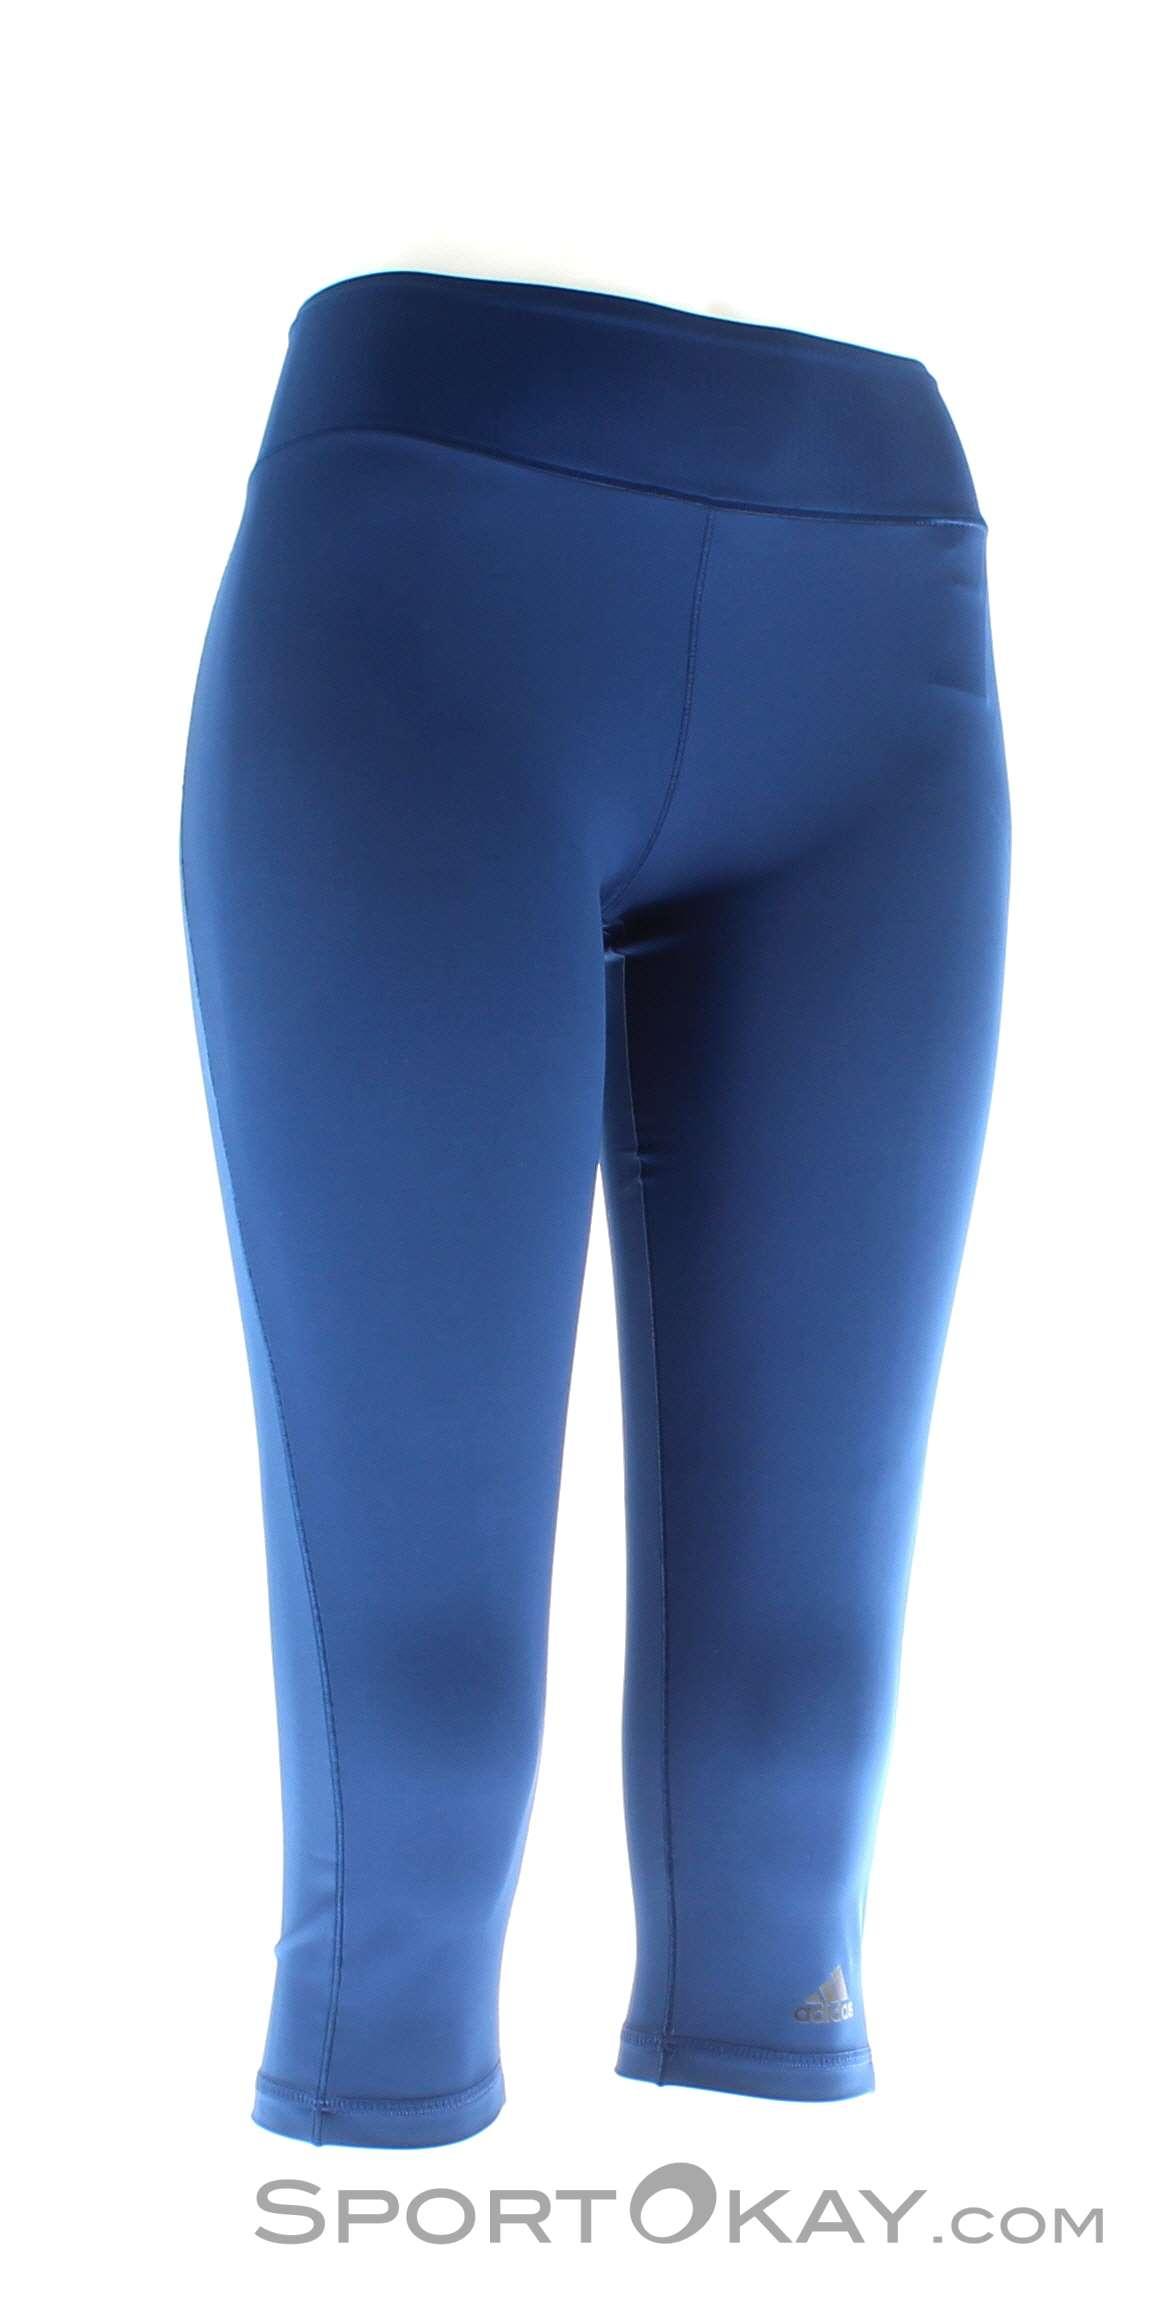 pantaloni adidas fitness donna tight